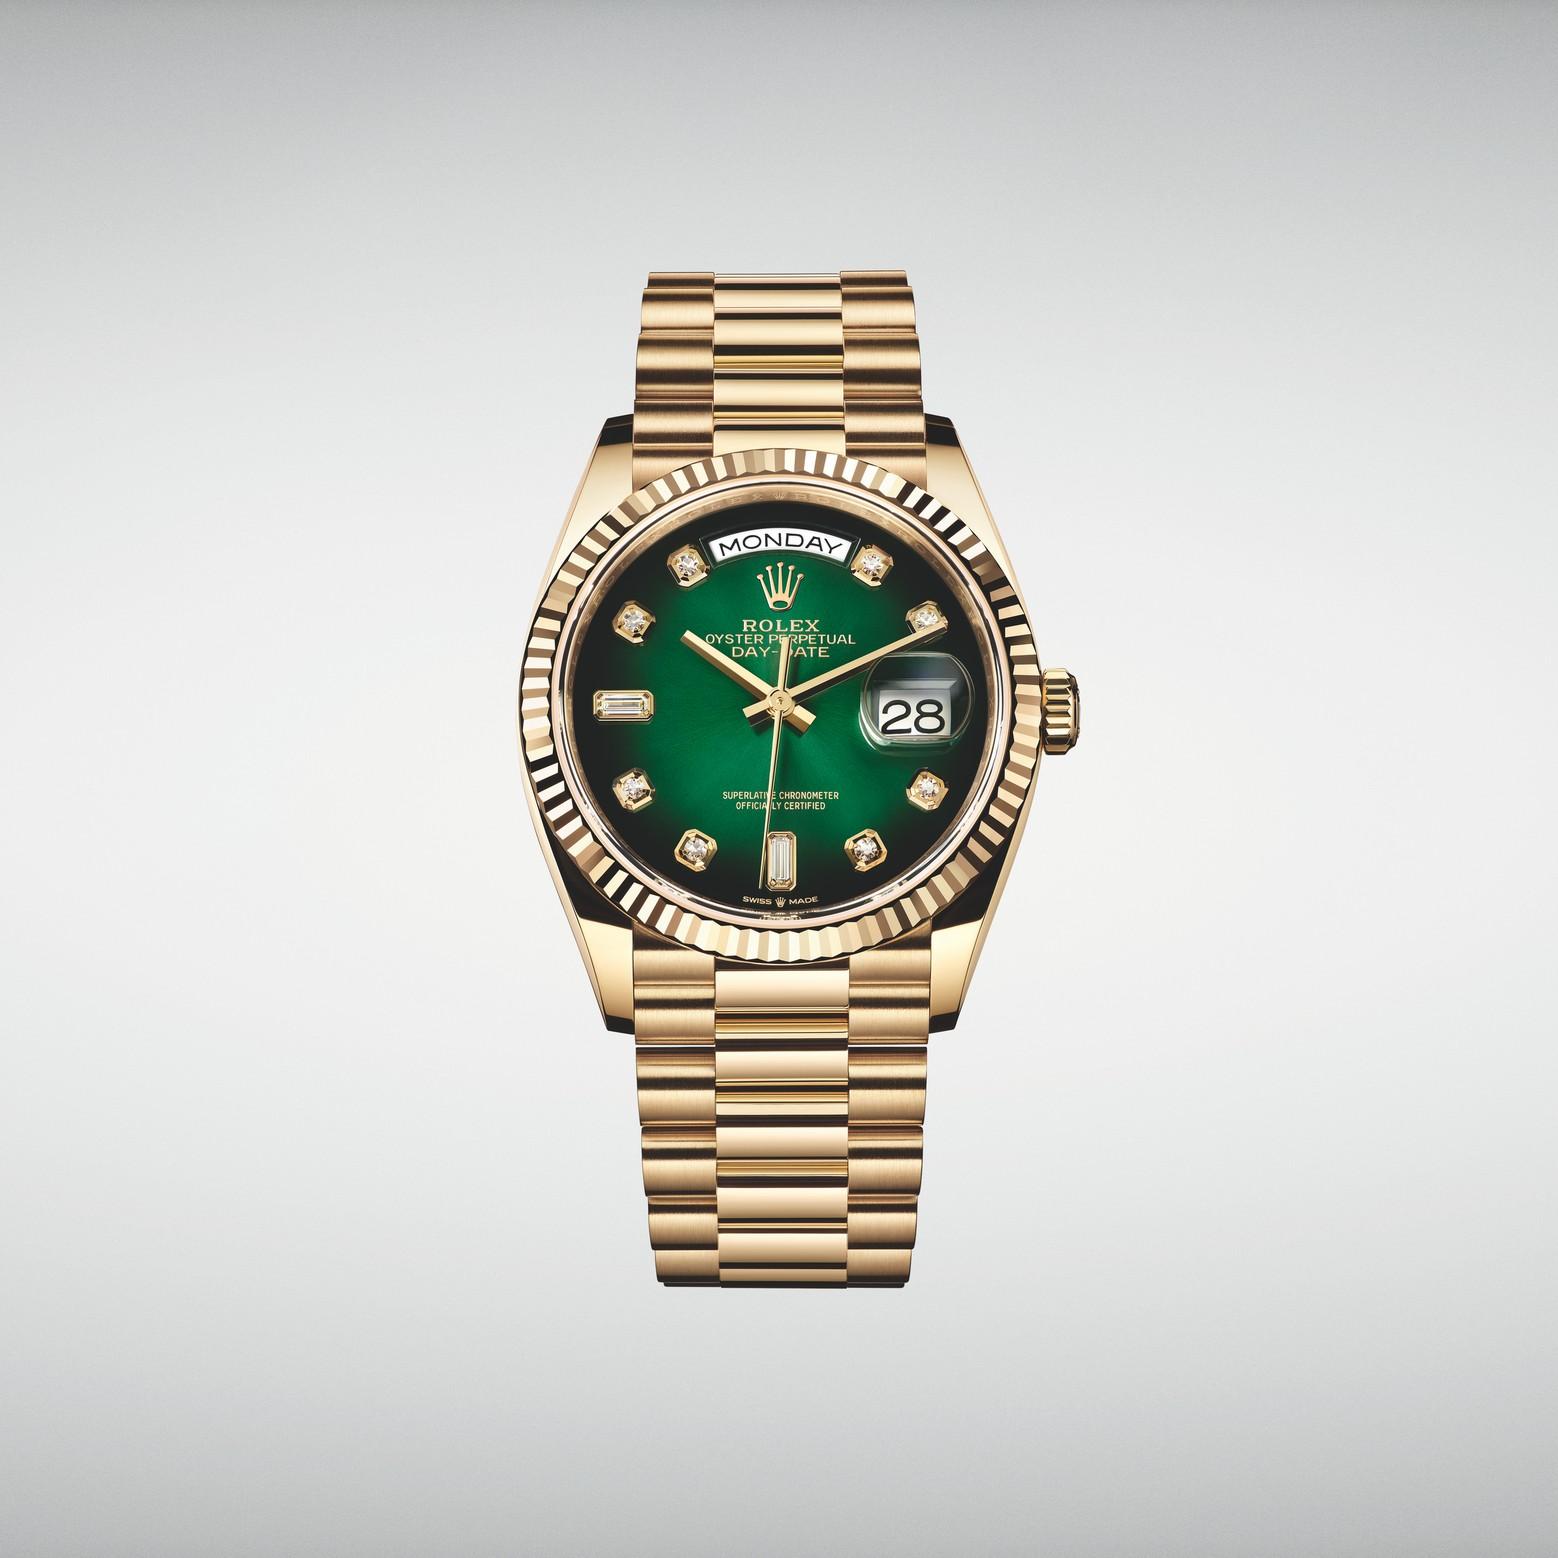 cf3ff1955f ... Rolex  Τα υπέροχα ολοκαίνουργια μοντέλα της σειράς Οyster